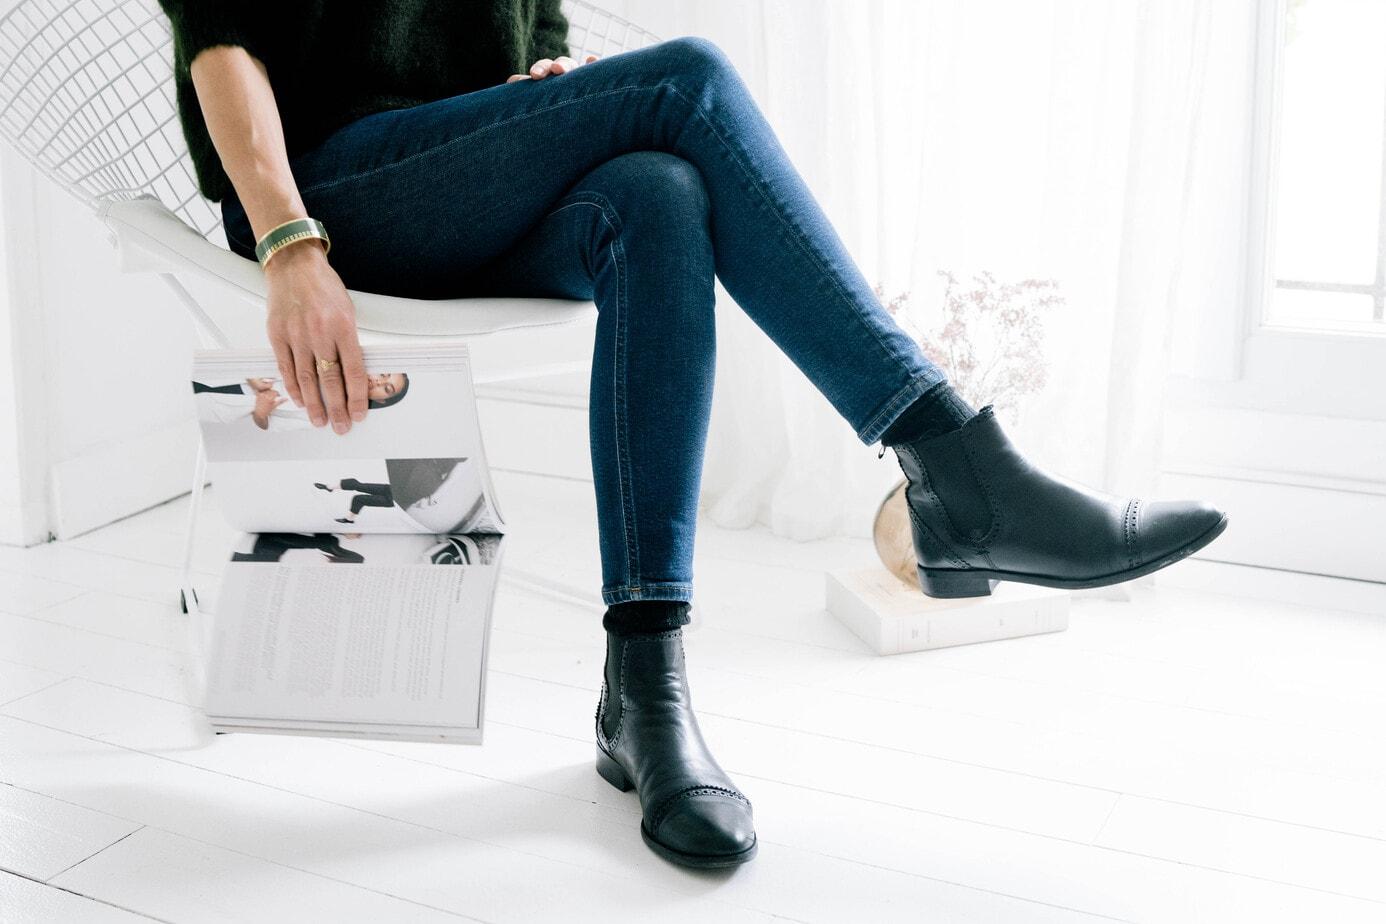 CHELSEA Boots femmes